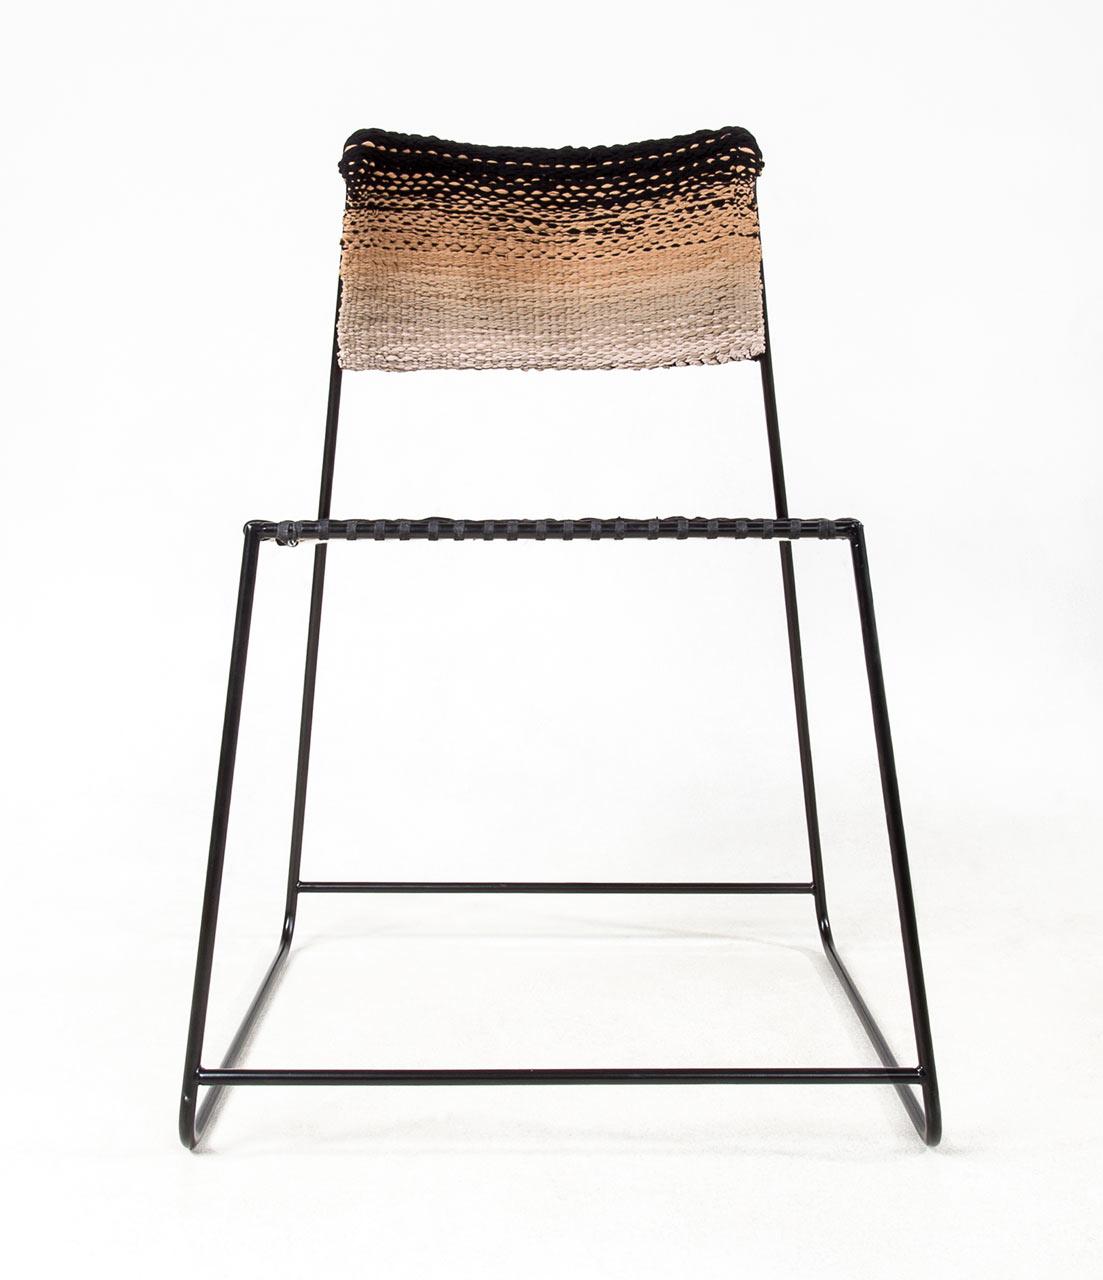 Anna-Herrmann-50-DENS-Chair-hisheji (1)